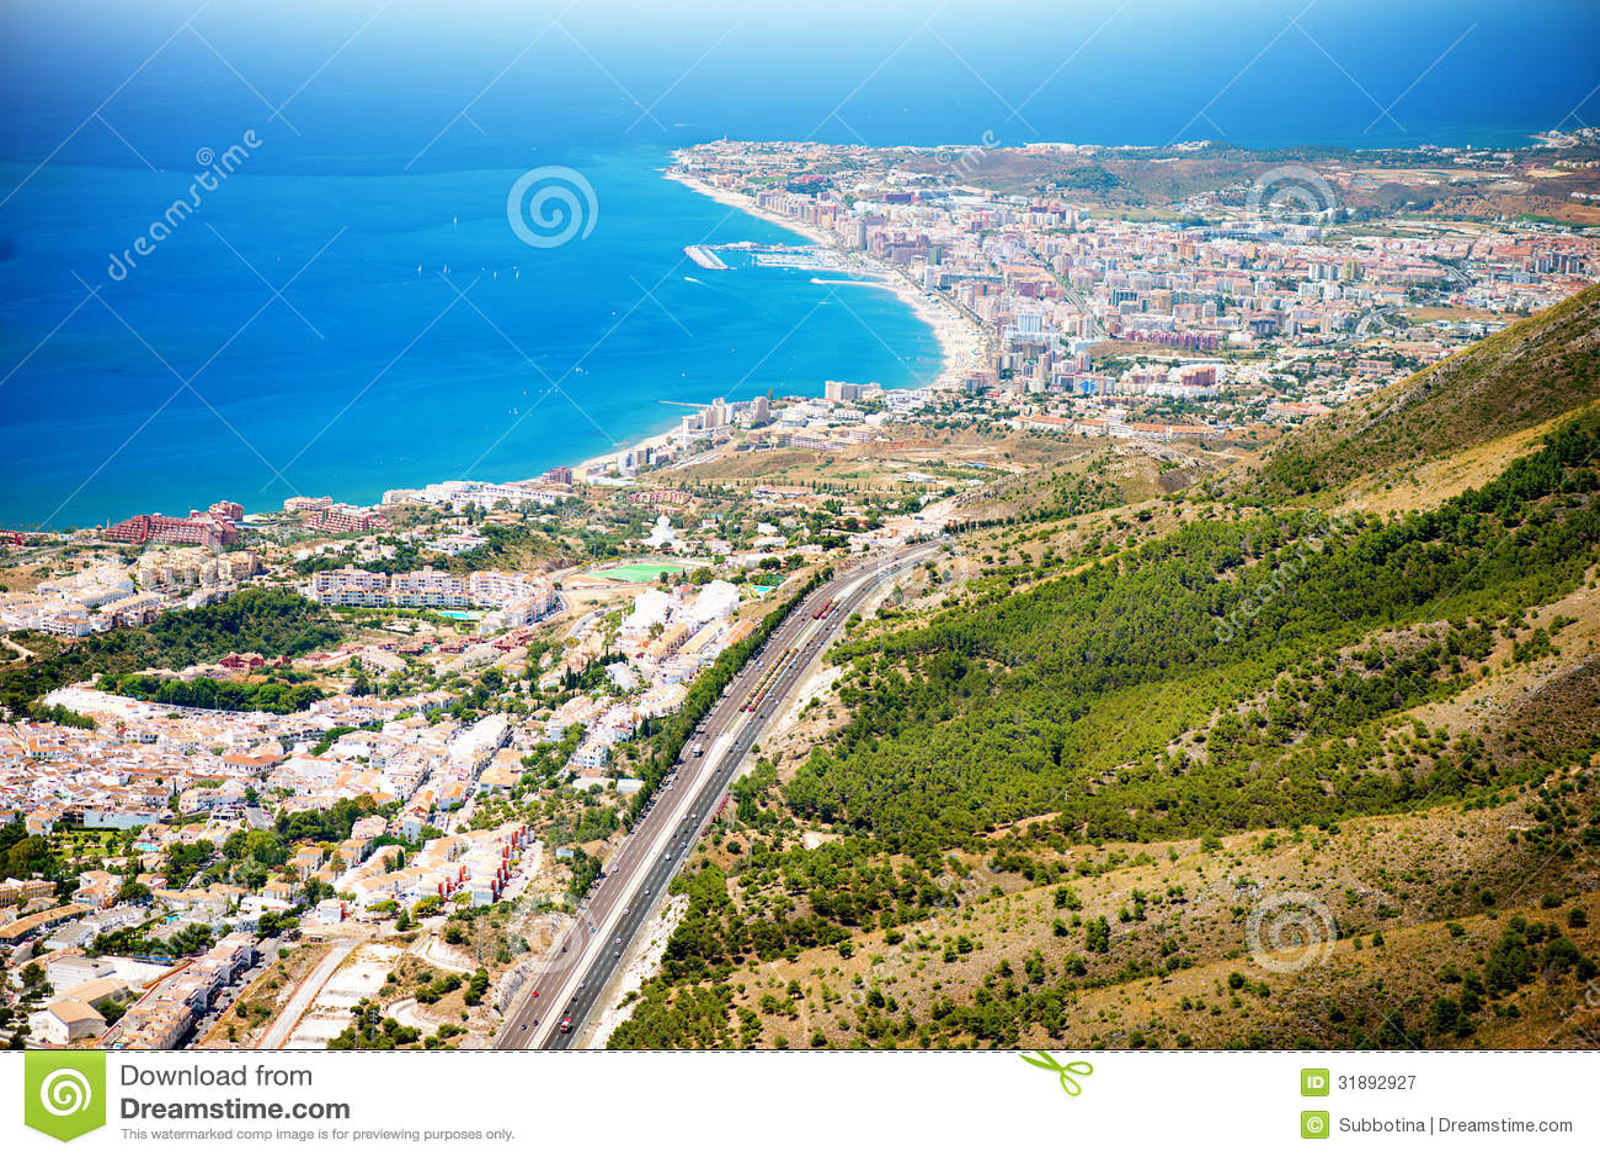 Aerial Panoramic View Of Costa Del Sol Royalty Free Stock